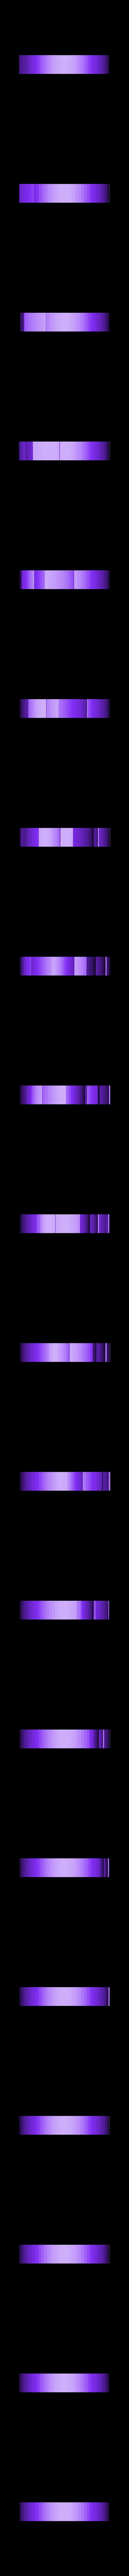 RedInsert.stl Télécharger fichier STL gratuit TlatPasot (imprimante 3d en hébreu) • Objet à imprimer en 3D, EliGreen